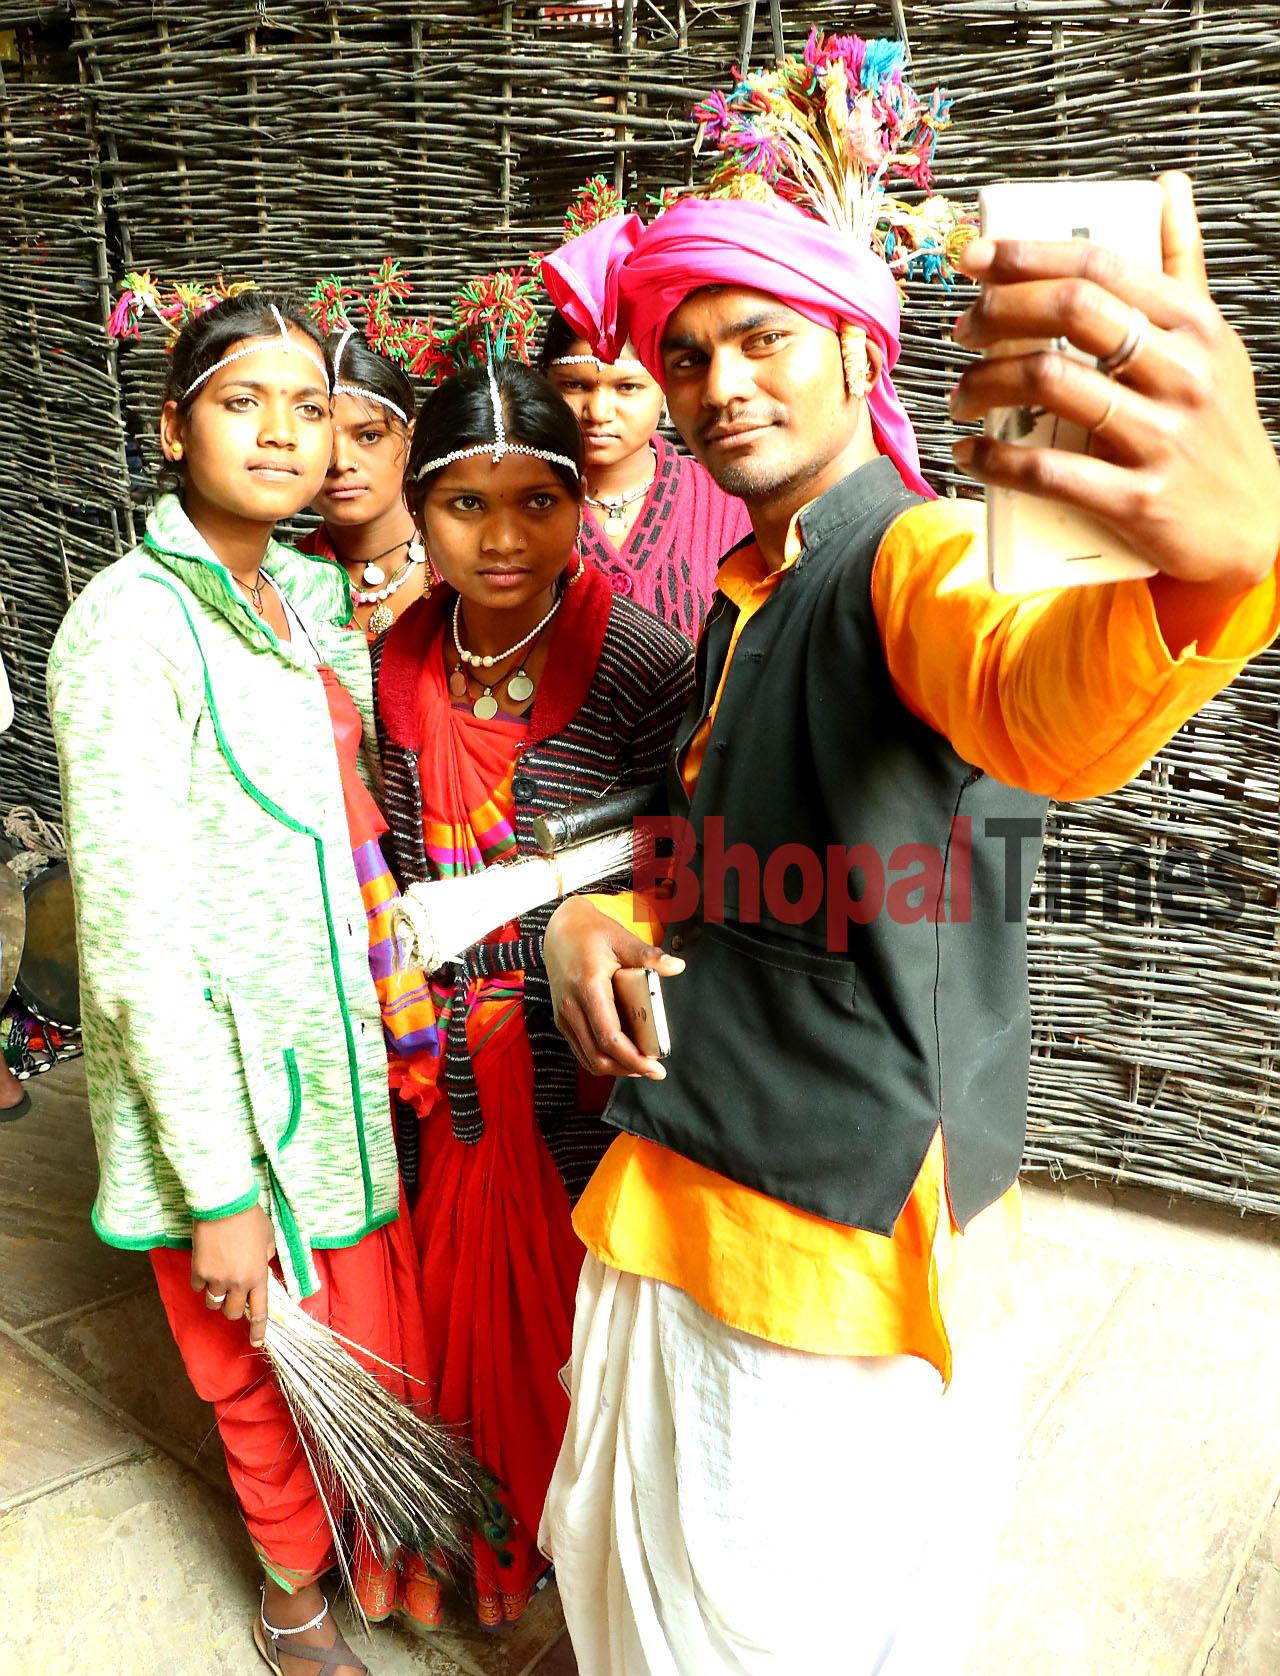 chal beta selfie lele re